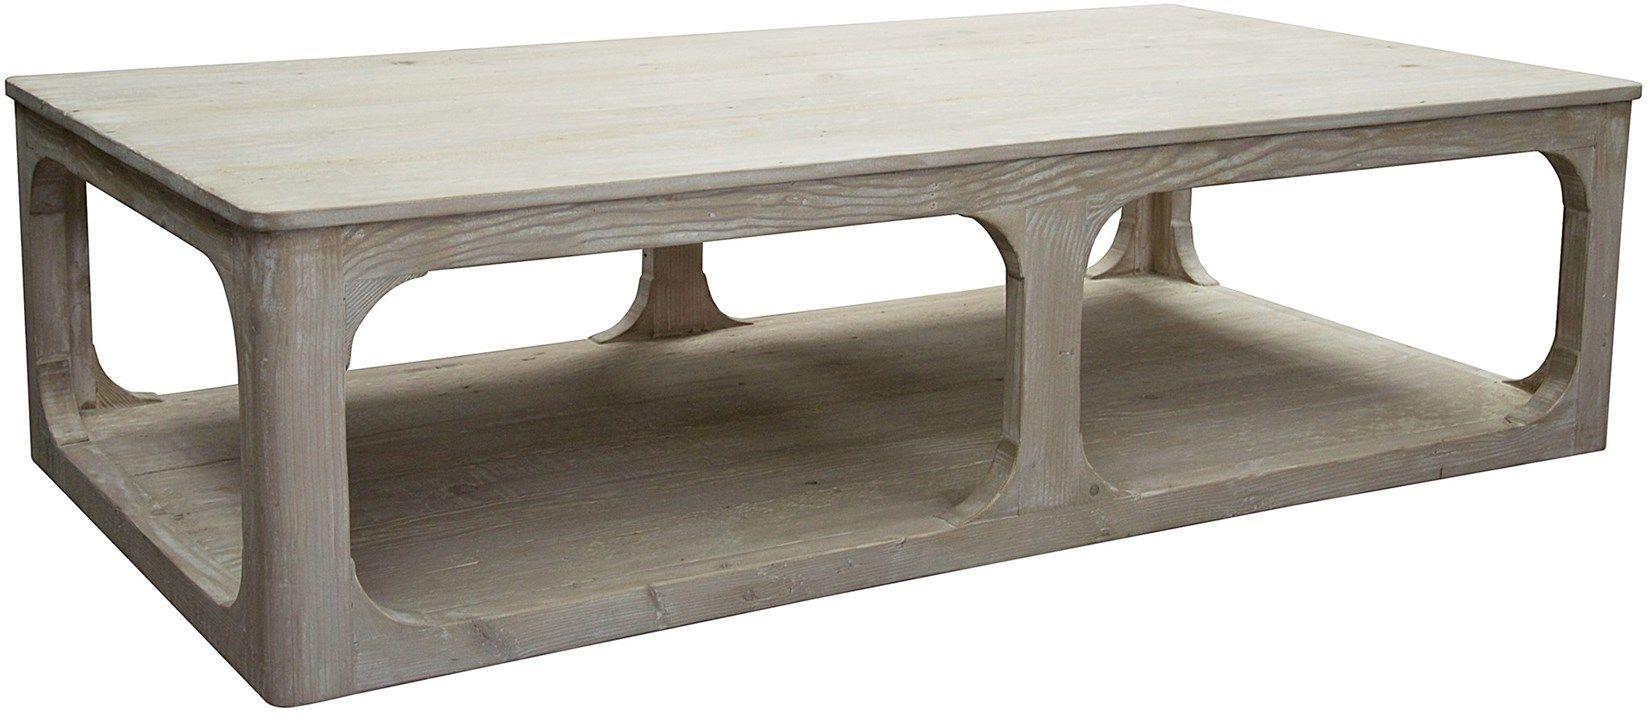 Cfc Reclaimed Lumber Gimso Coffee Table Coffee Table Reclaimed Wood Coffee Table Reclaimed Coffee Table